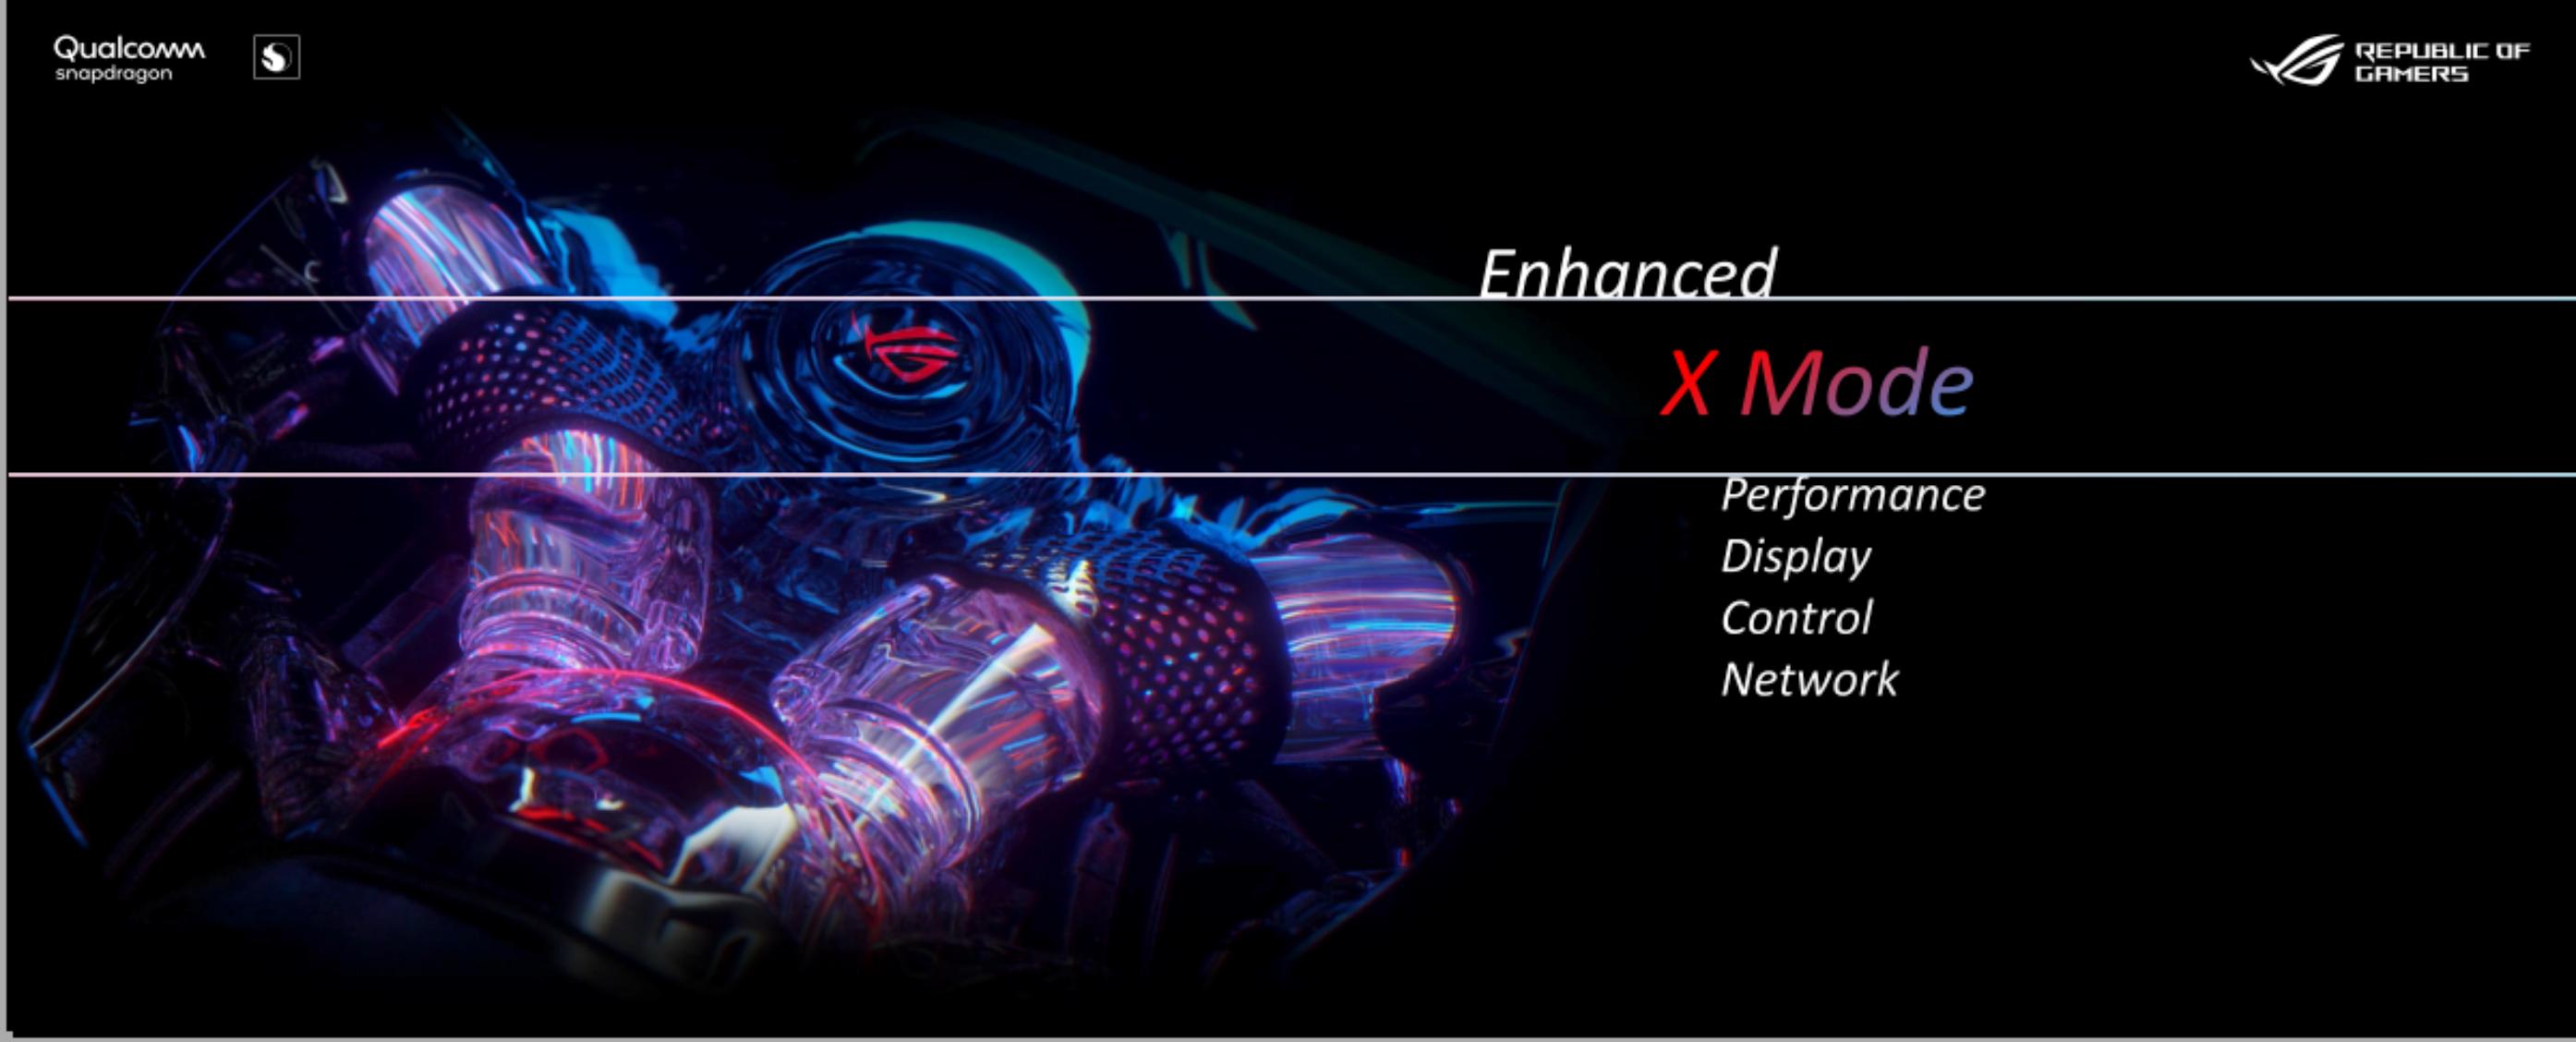 Fitur X Mode, Main Game Makin PD